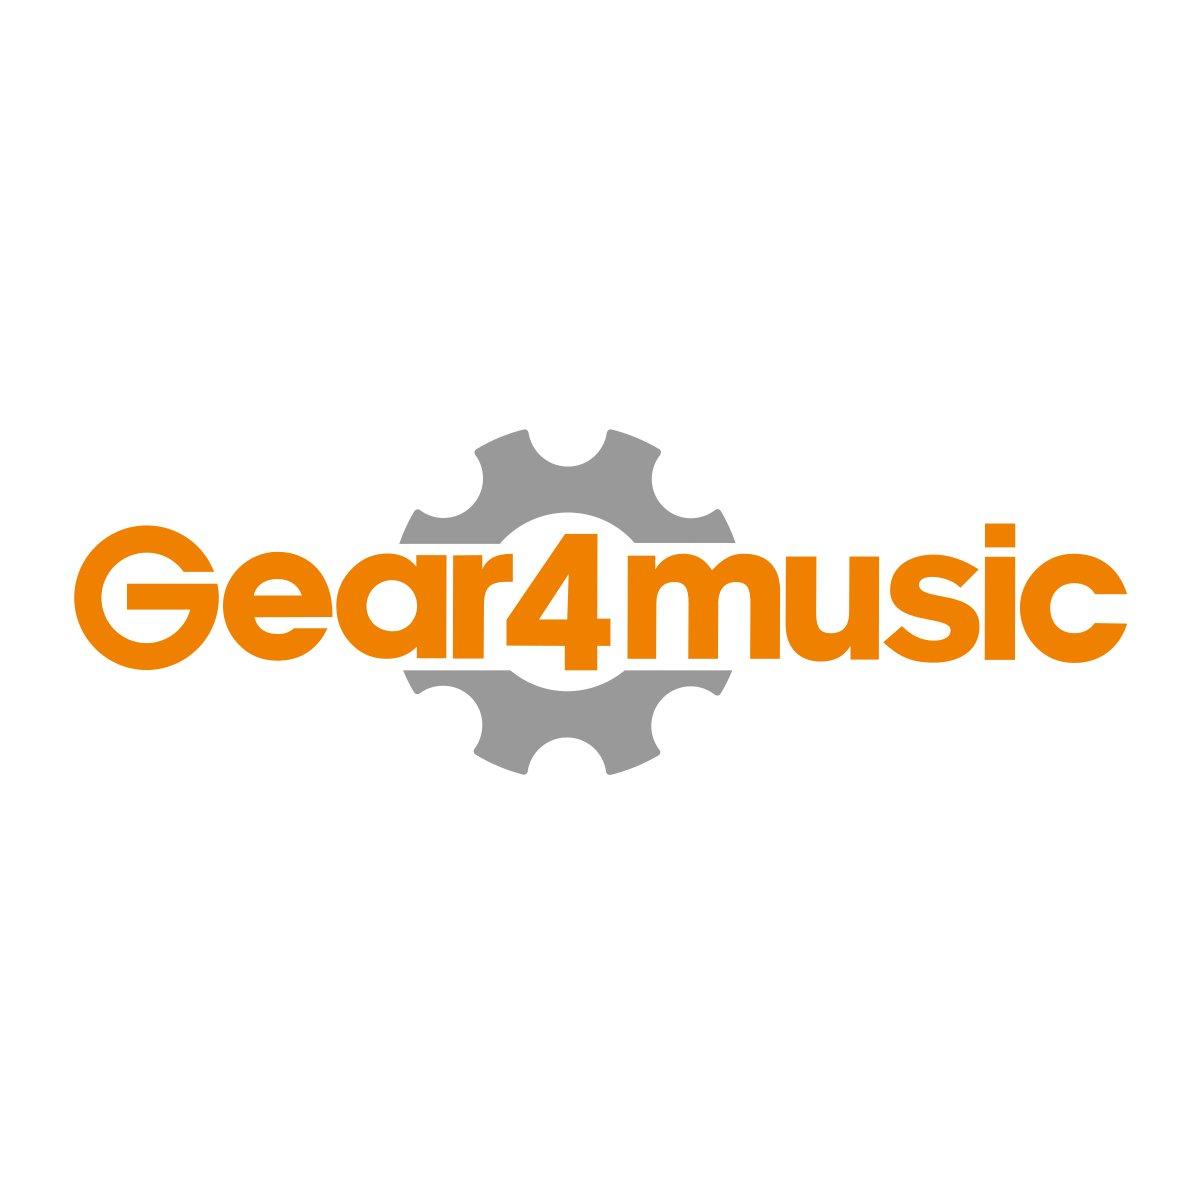 MIDI Keyboards | Gear4music